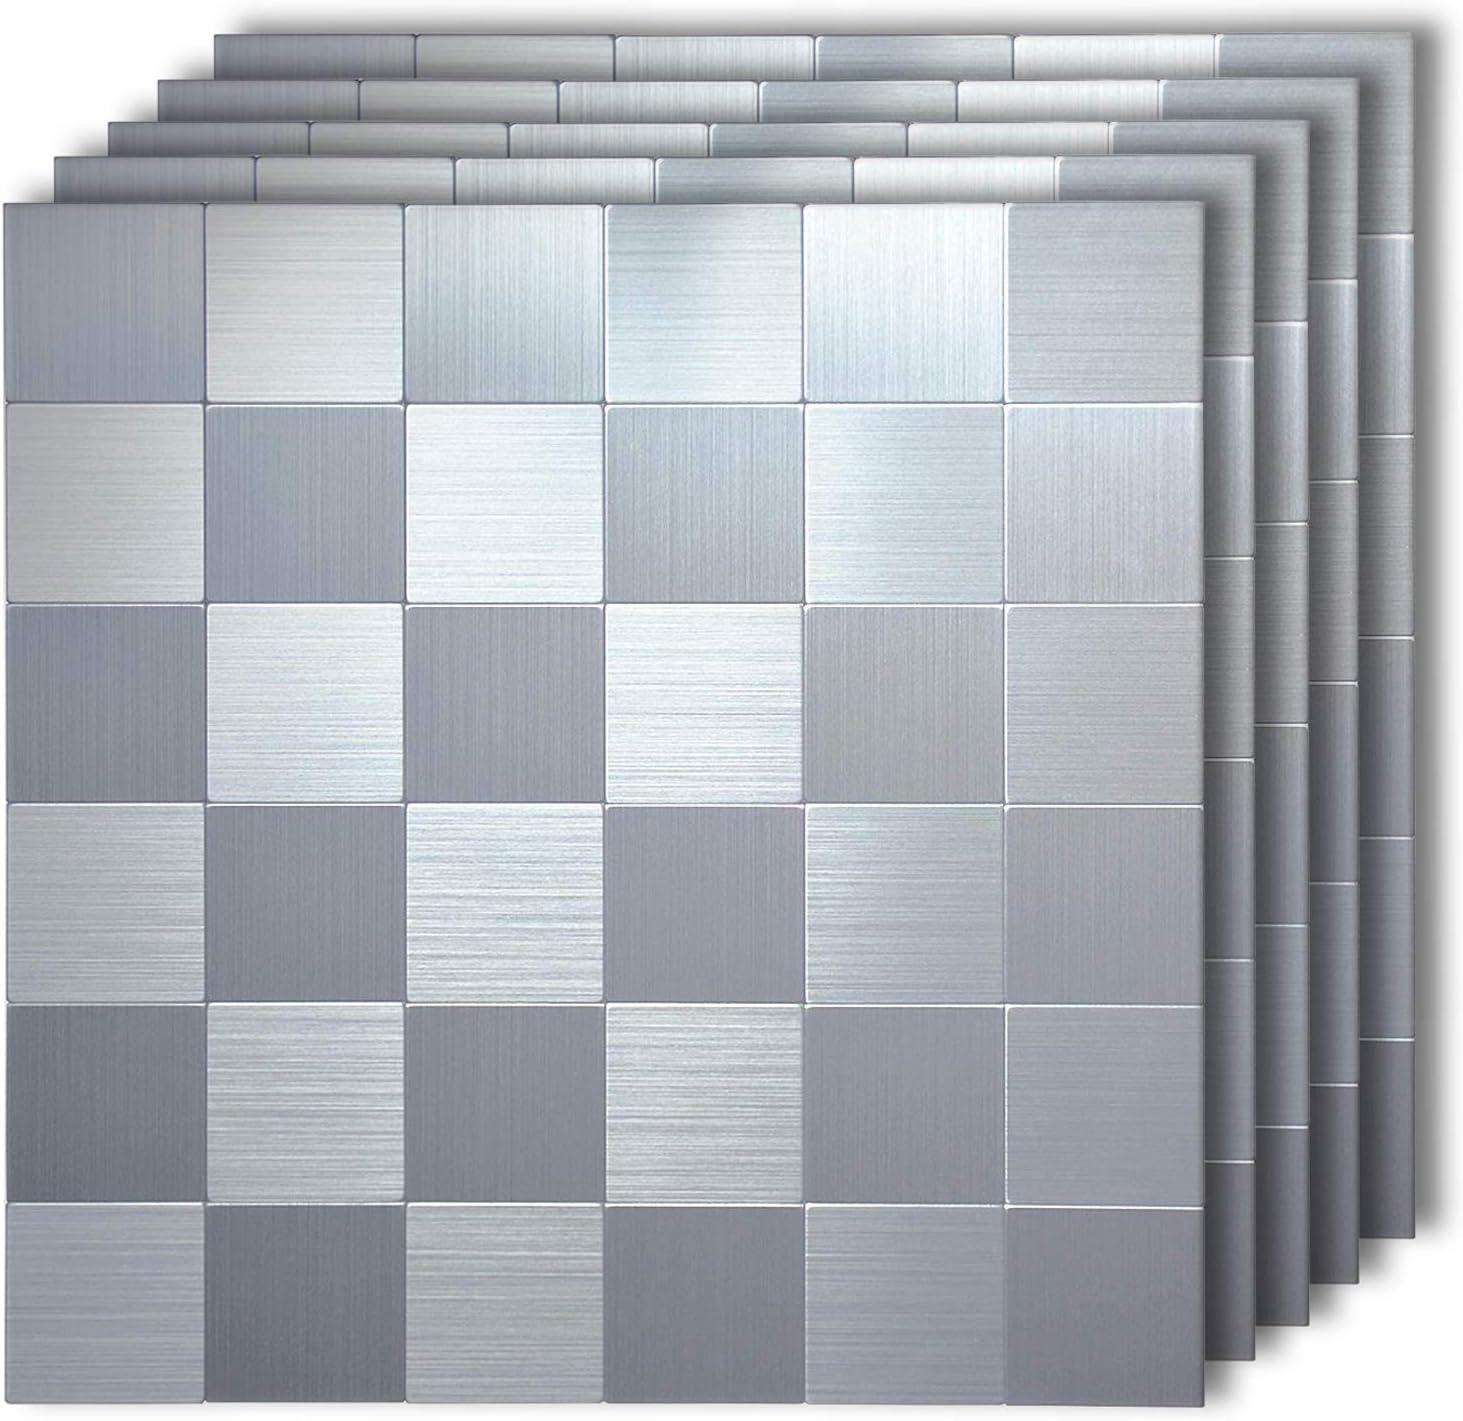 - Amazon.com: HomeyMosaic Moonlight Silver Peel And Stick Tile